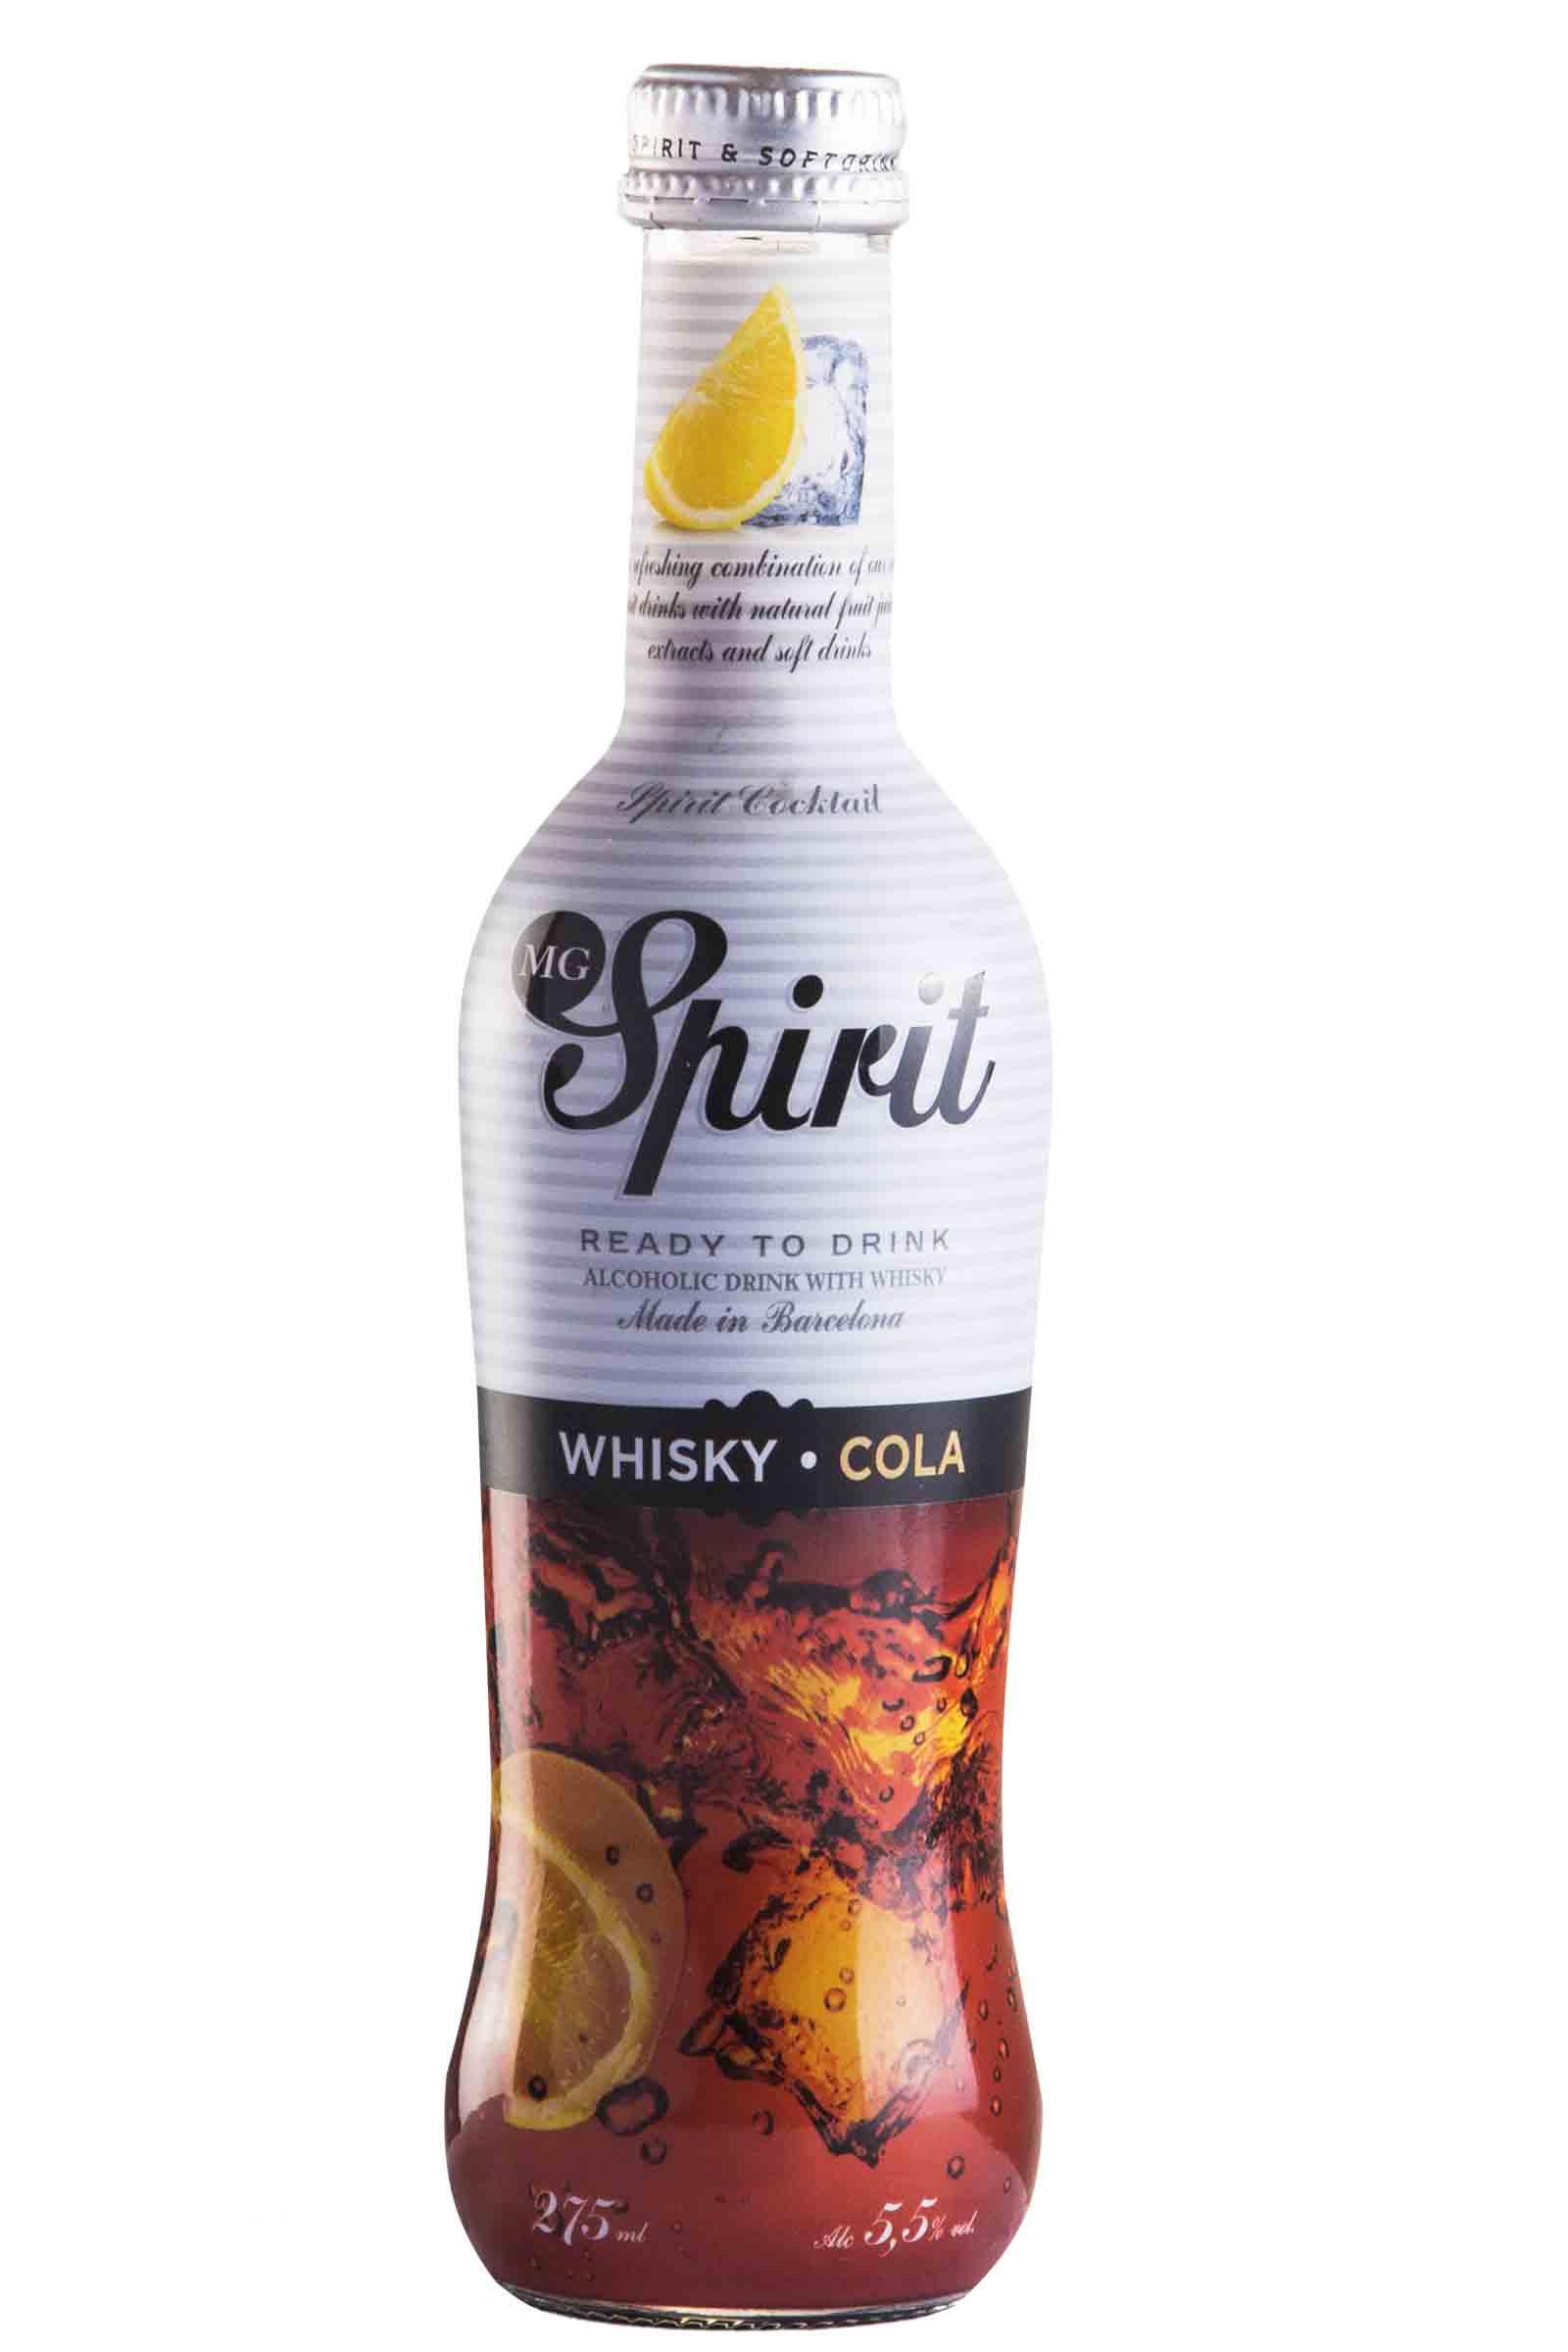 MG Spirits Whisky Cola 275ml